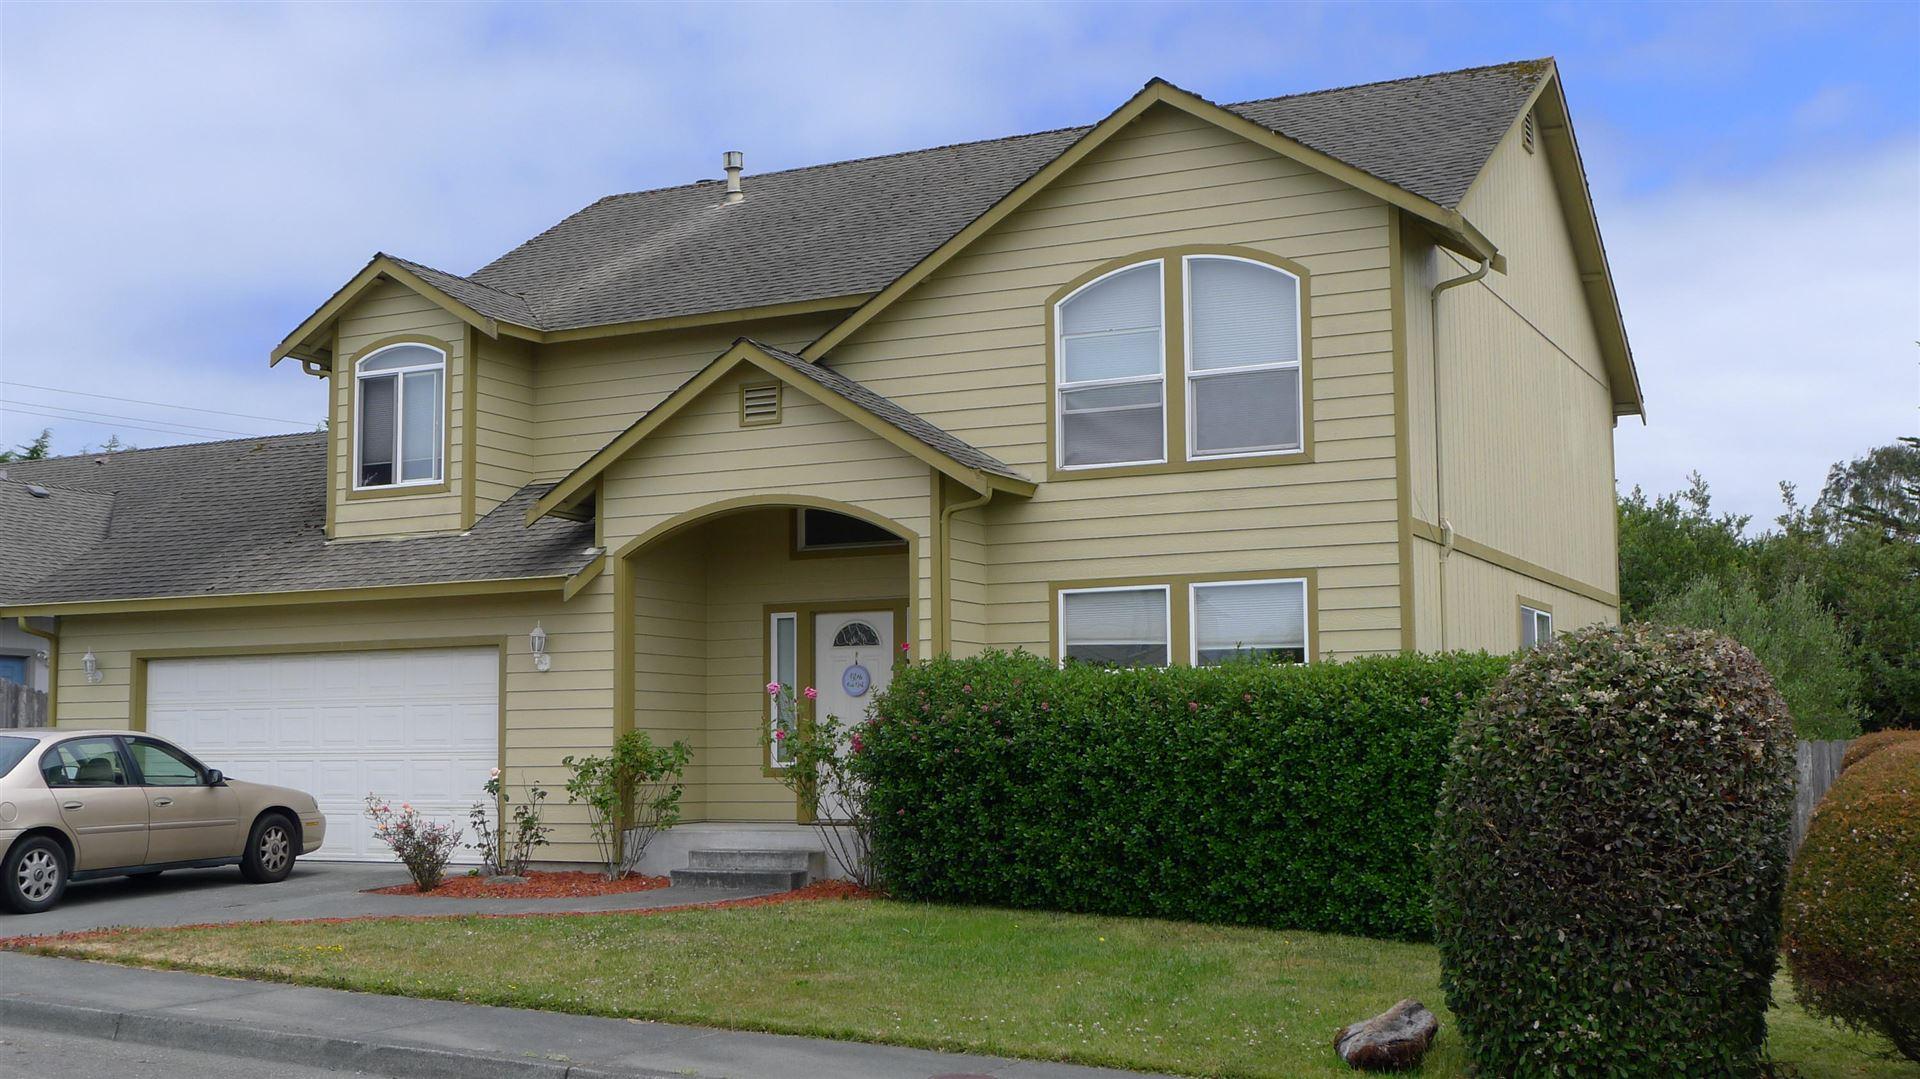 5325 Bay Pointe Court, Eureka, CA 95503 - MLS#: 256845